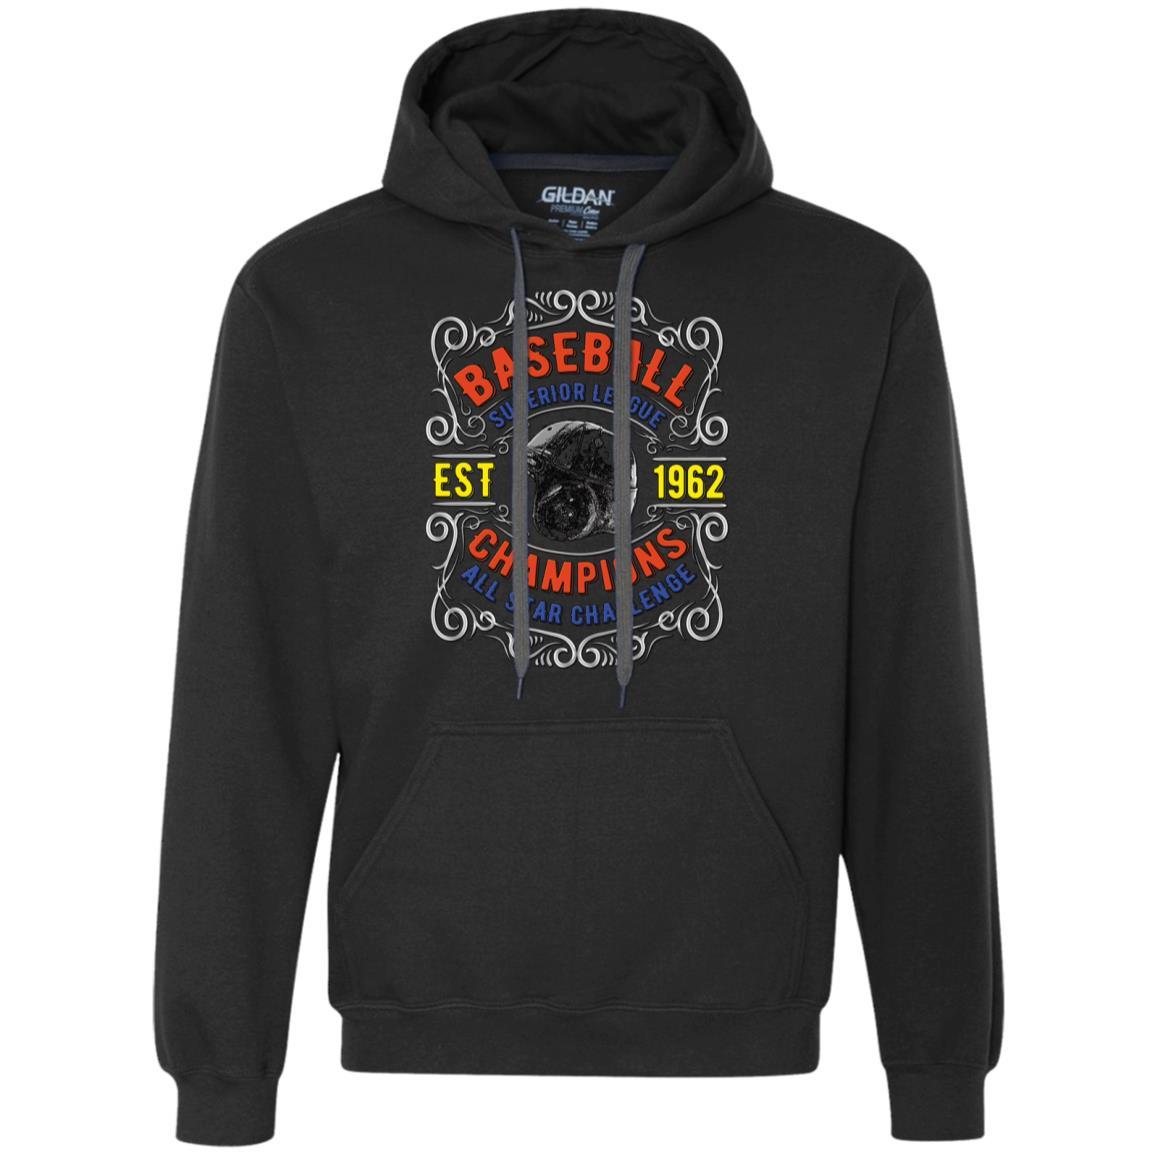 Baseball Champions Heavyweight Pullover Fleece Sweatshirt